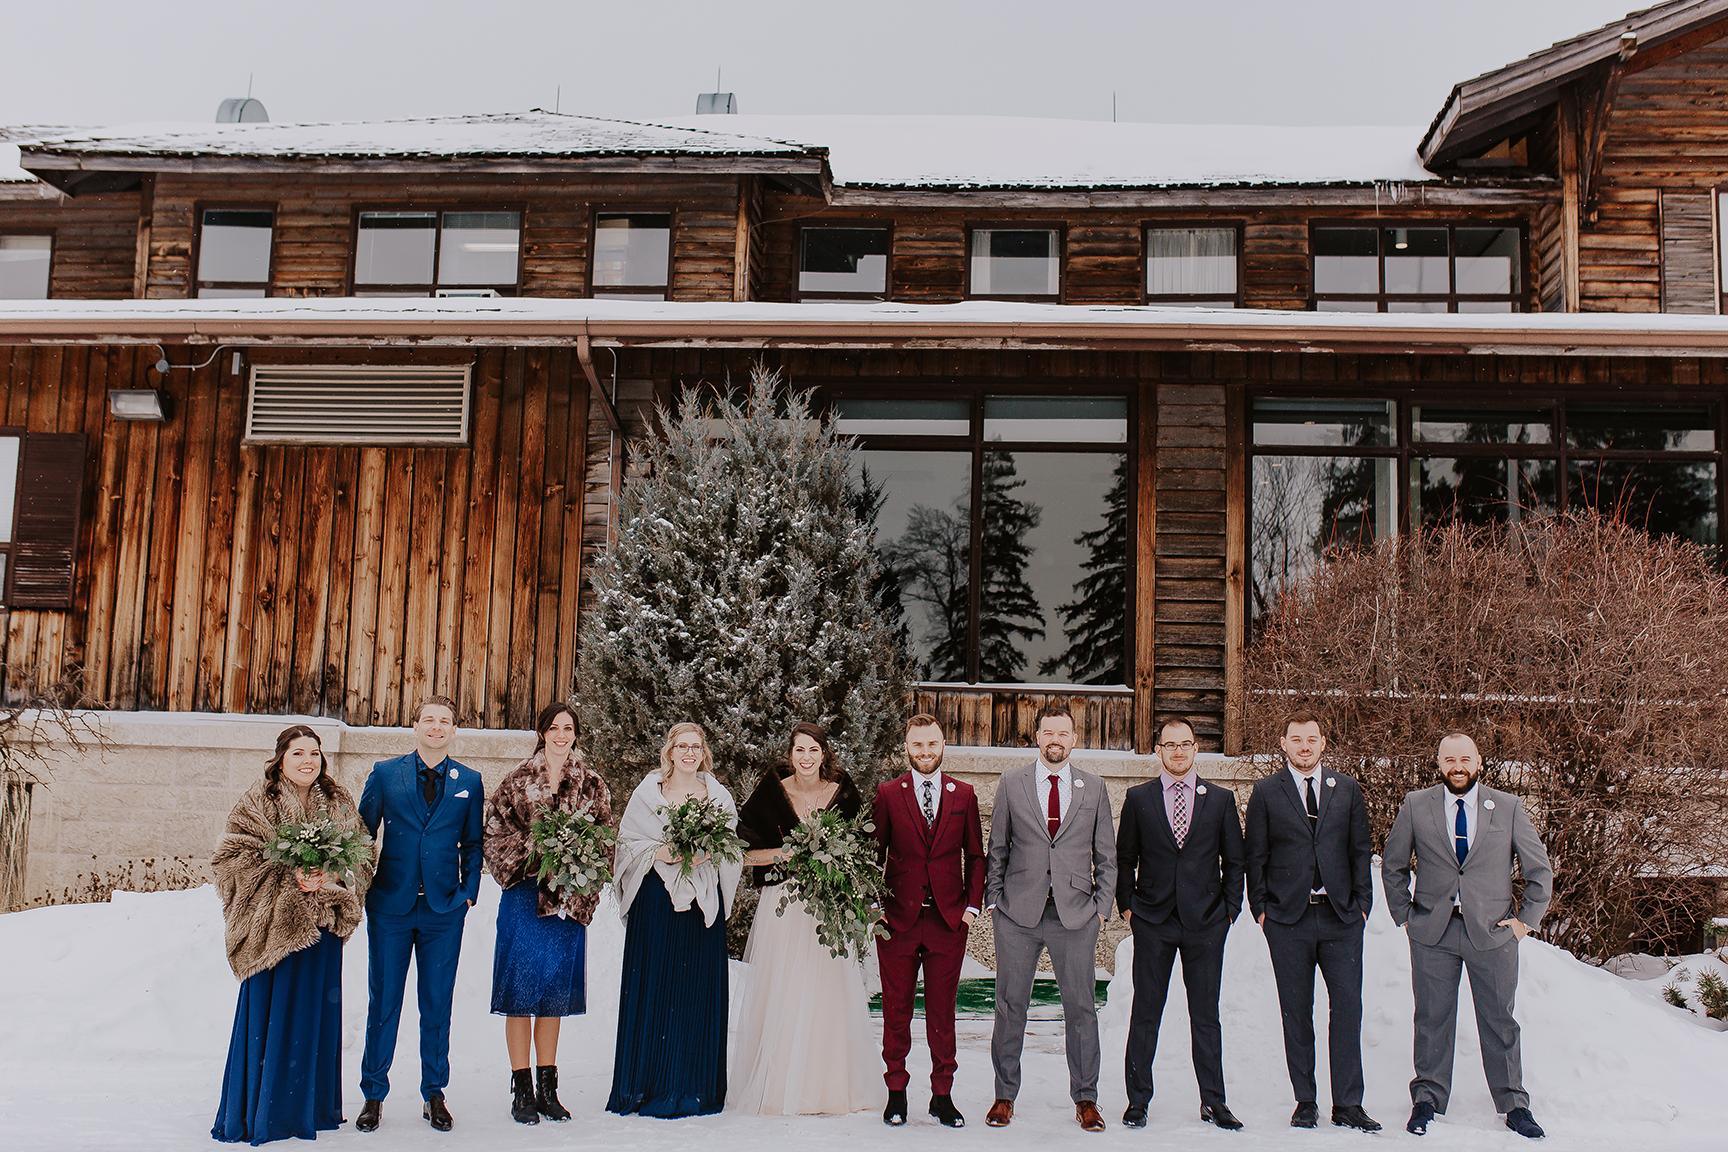 Wedding_Party_Formals_67_web.jpg